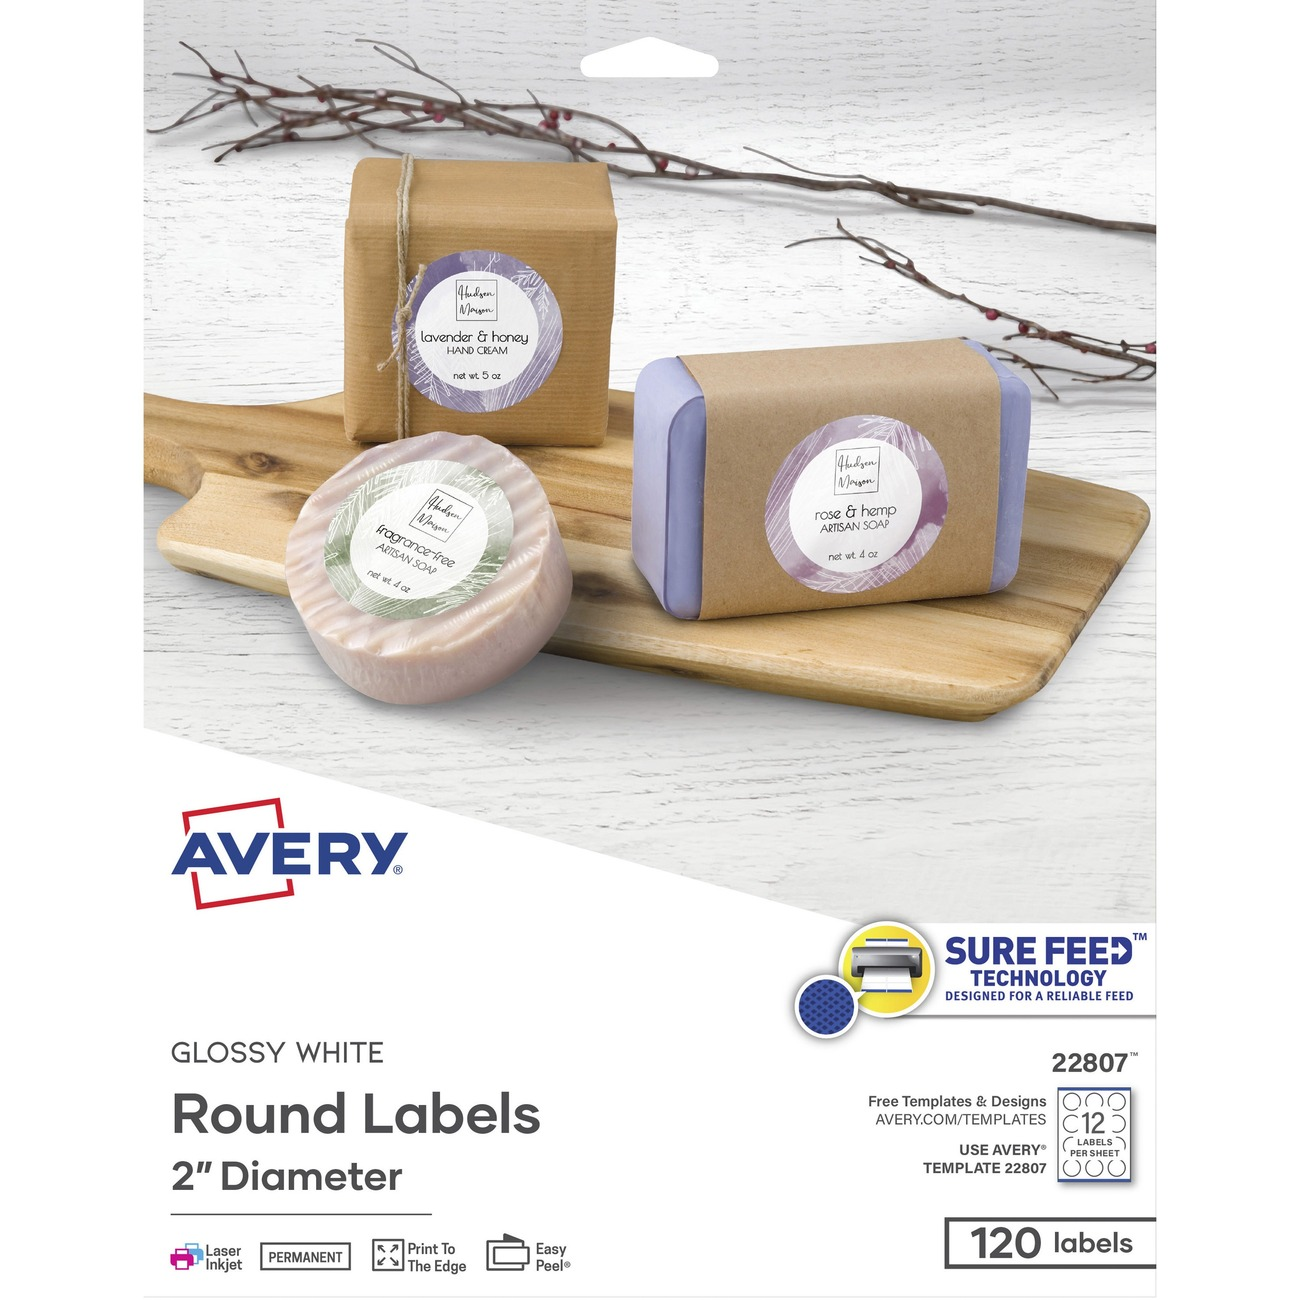 AVE 22807 Avery Easy Peel Print-to-the-Edge White Glosy Round Labels